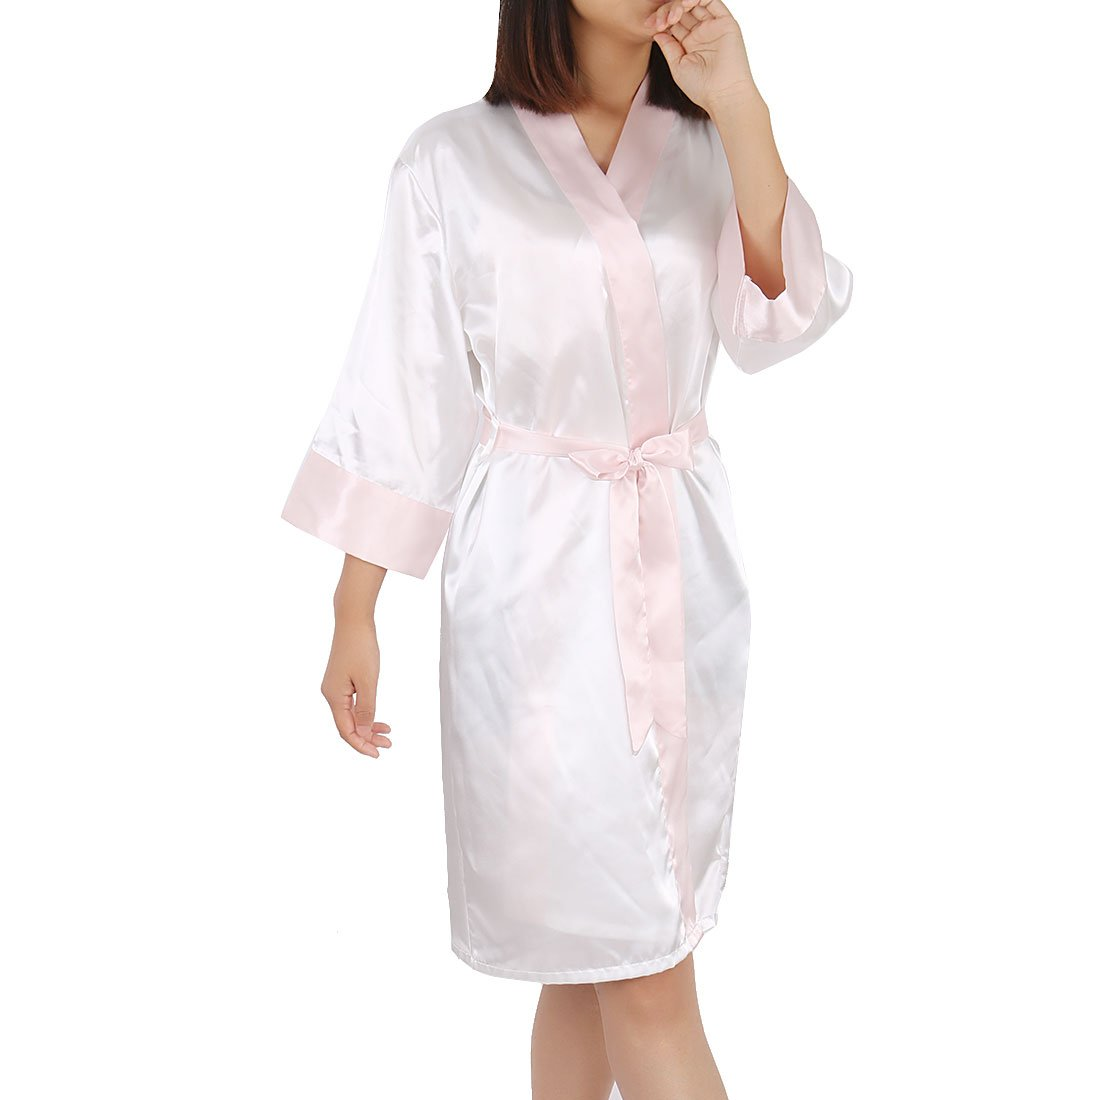 cff1a5711 Amazon.com  uxcell Womens Kimono Robe Silk Satin Bridal Lingerie Short  Sleepwear (White+Light Pink